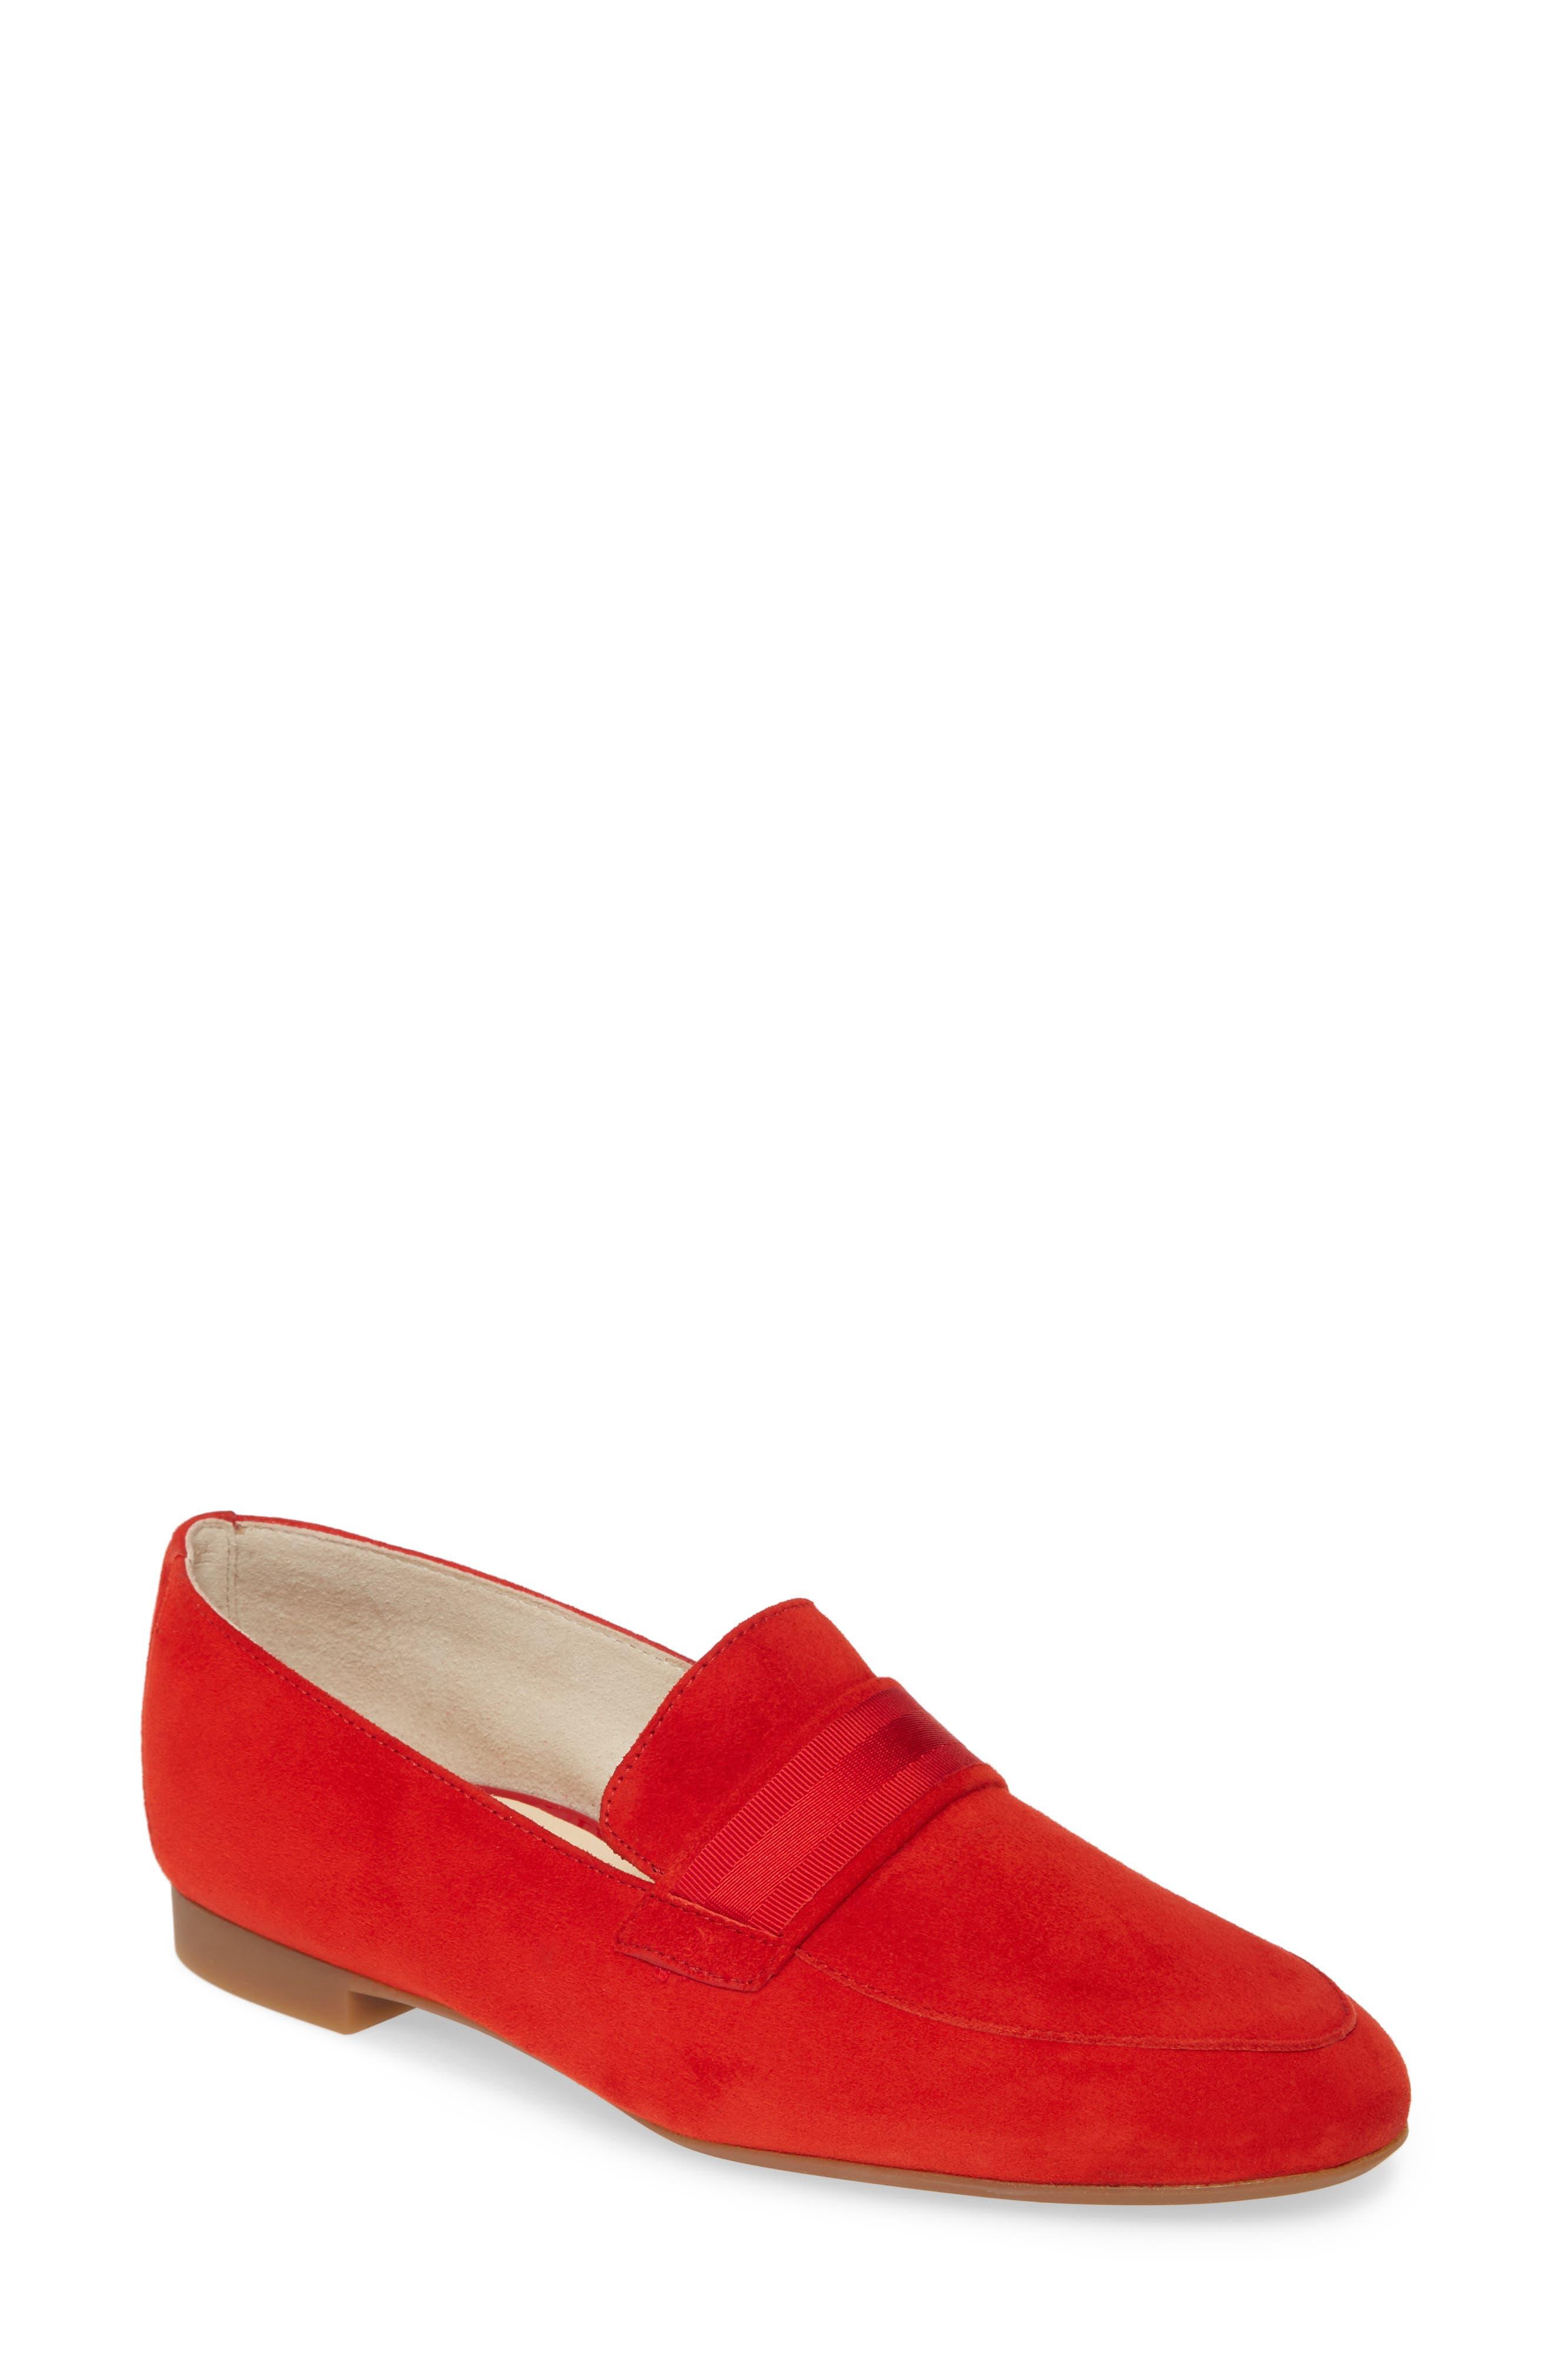 Paul Green Adelle Loafer, US/ 5.5UK - Red